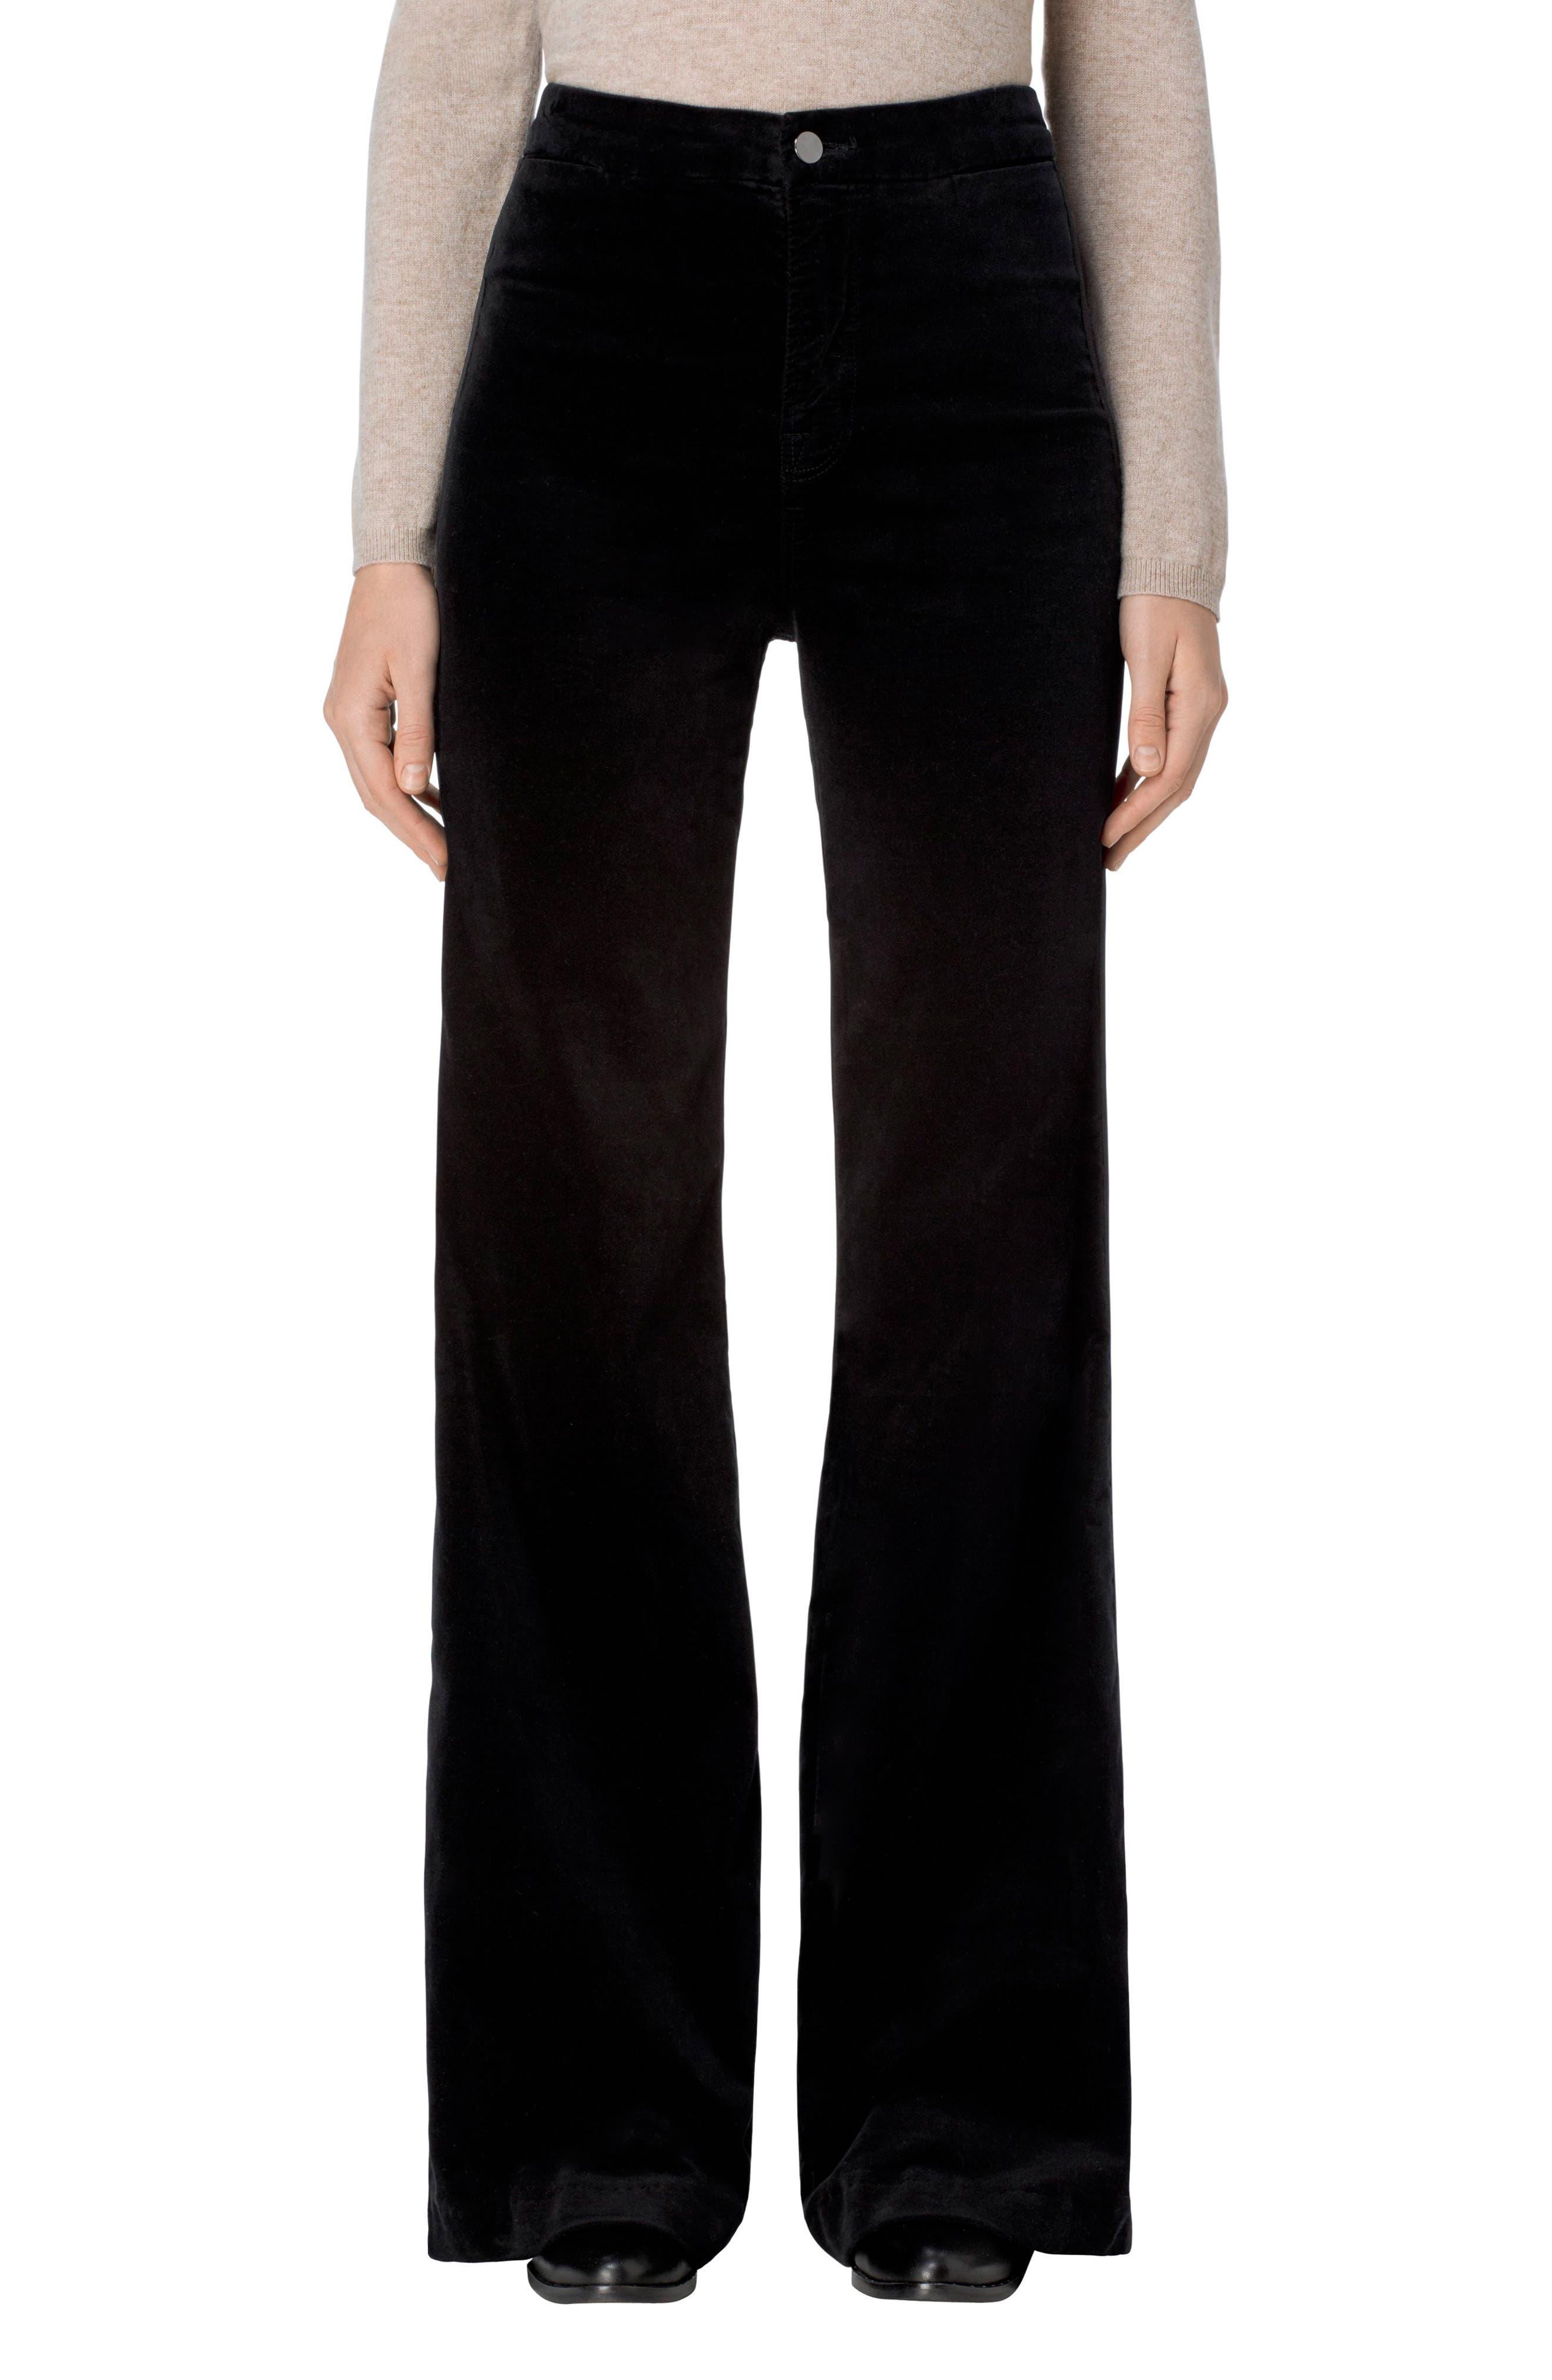 Isabella High Rise Flare Leg Pants,                         Main,                         color, 001